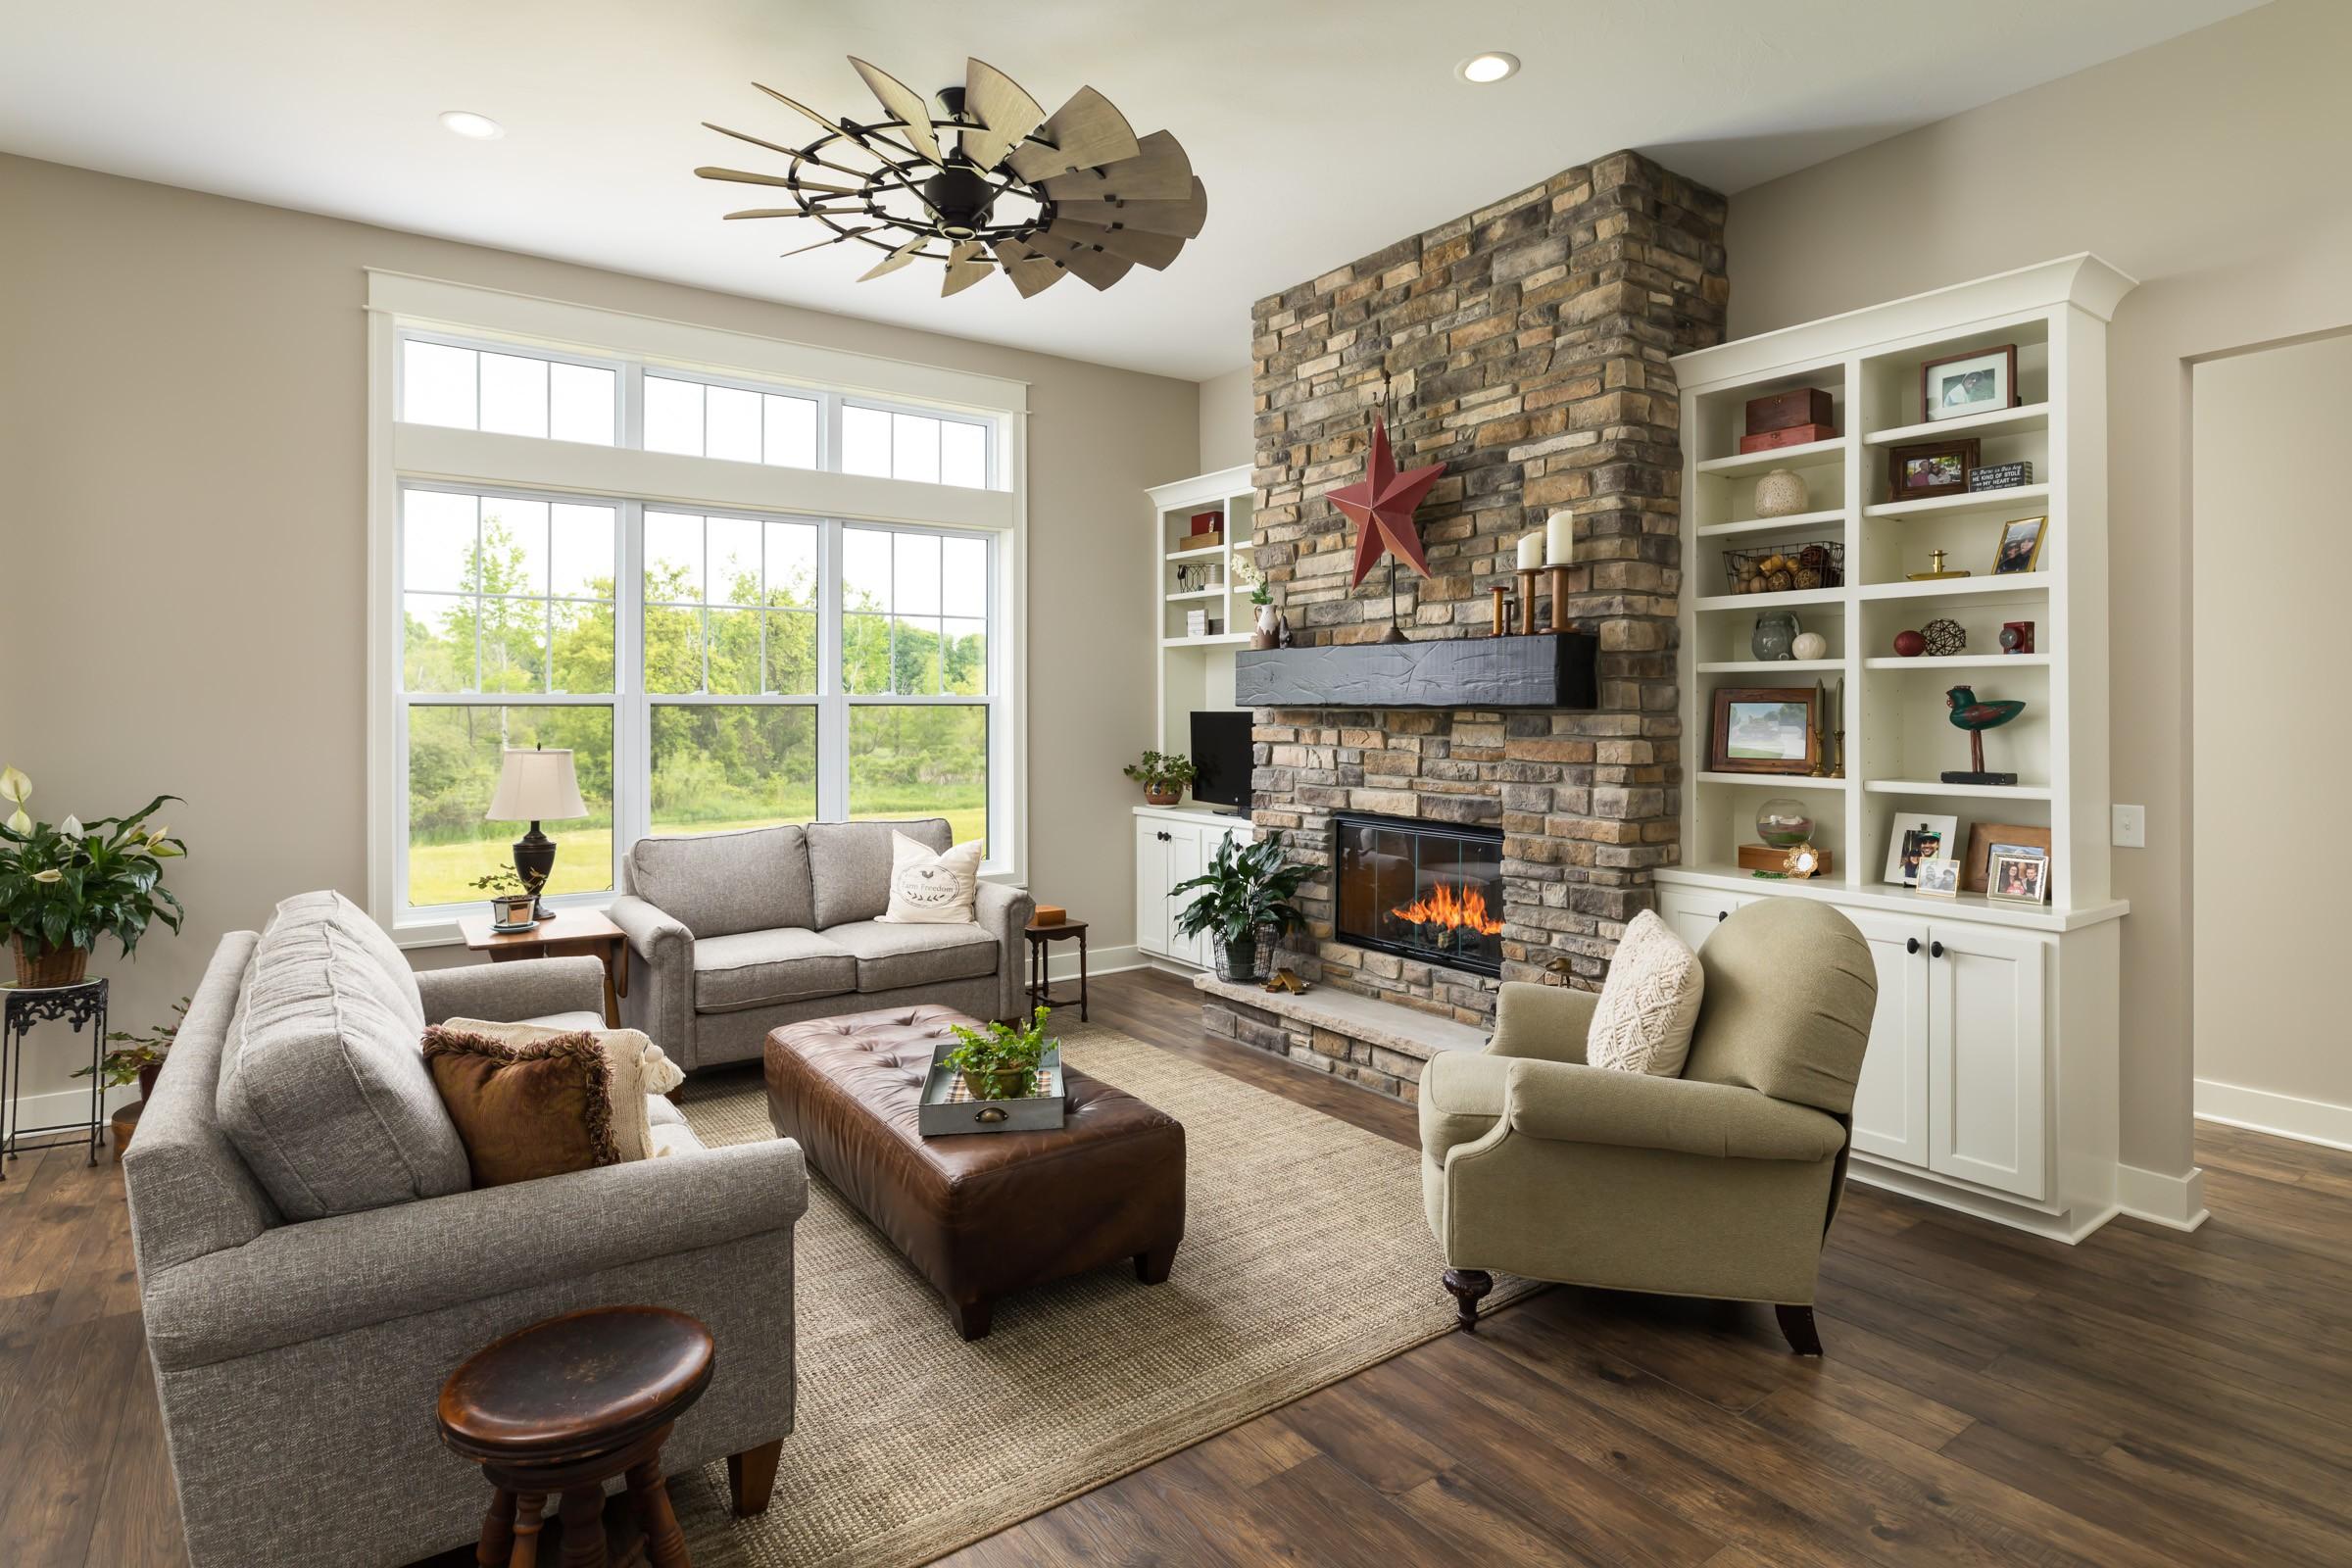 75 Beautiful Laminate Floor Living Room, Laminate Flooring Living Room